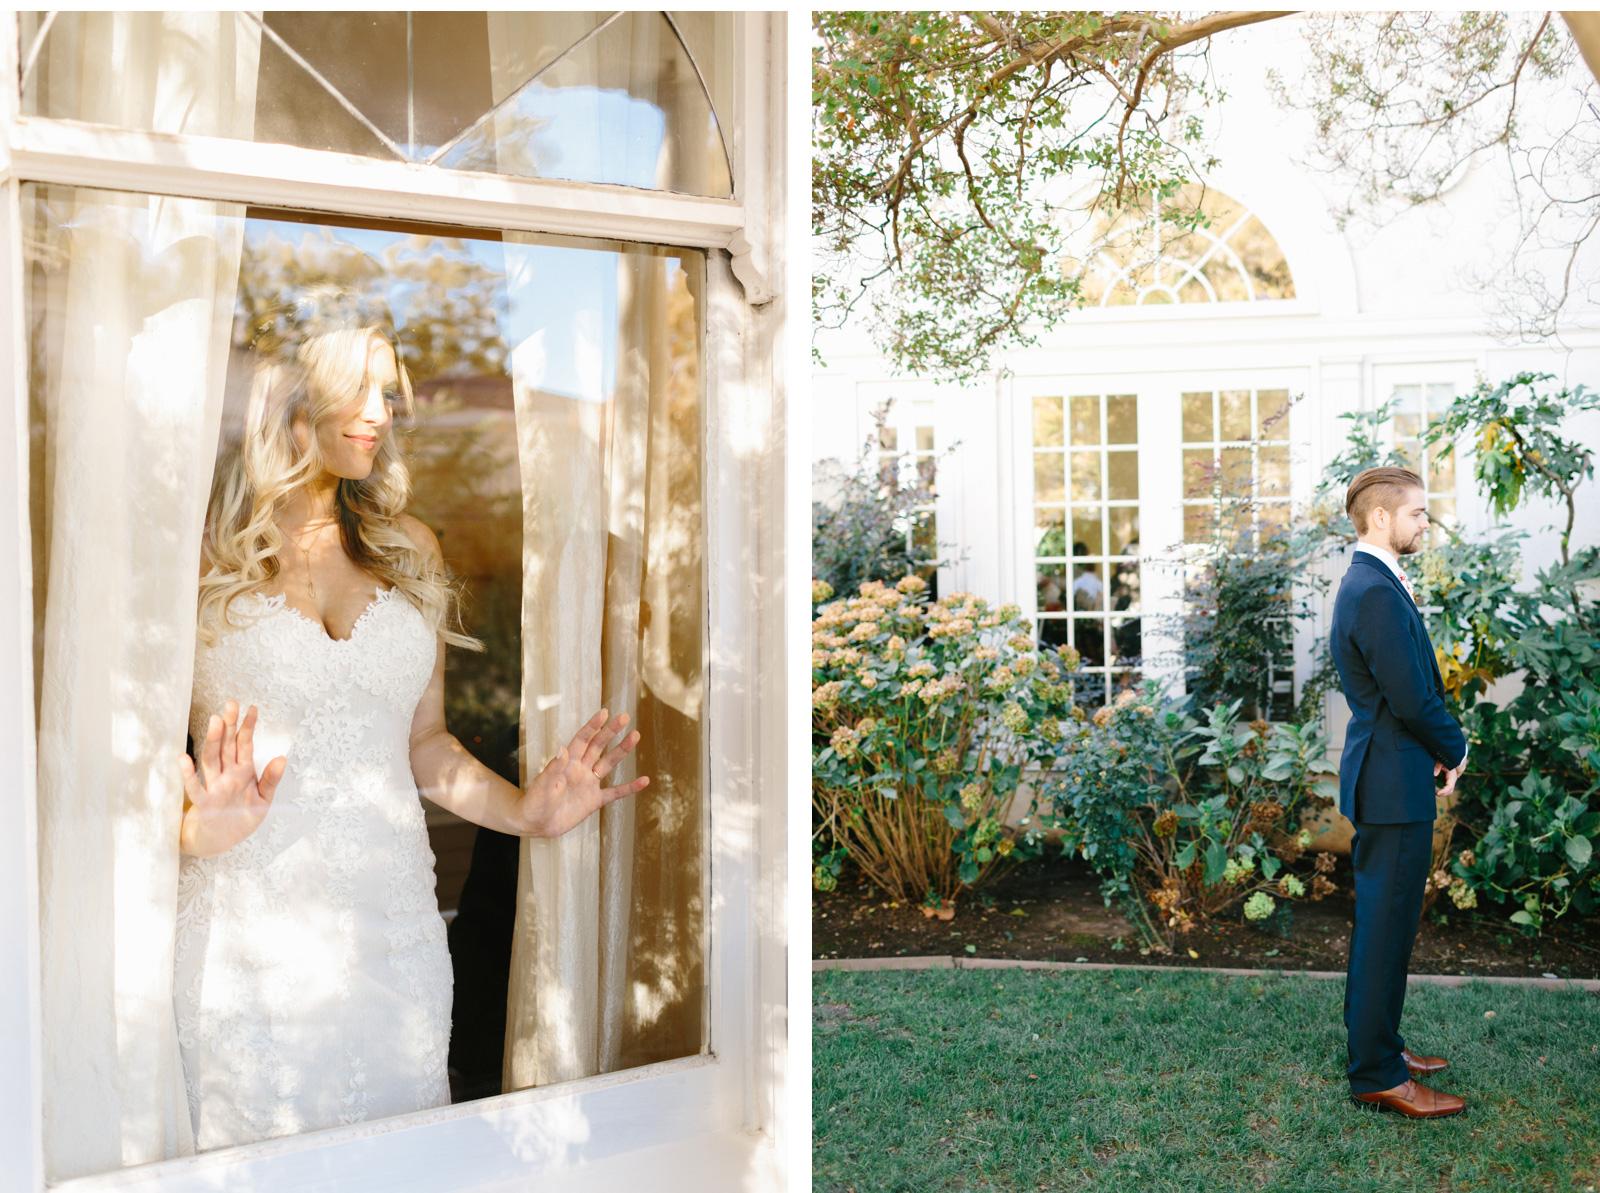 Malibu-Wedding-Photographer-Natalie-Schutt-Photography-Vizcaya_01.jpg